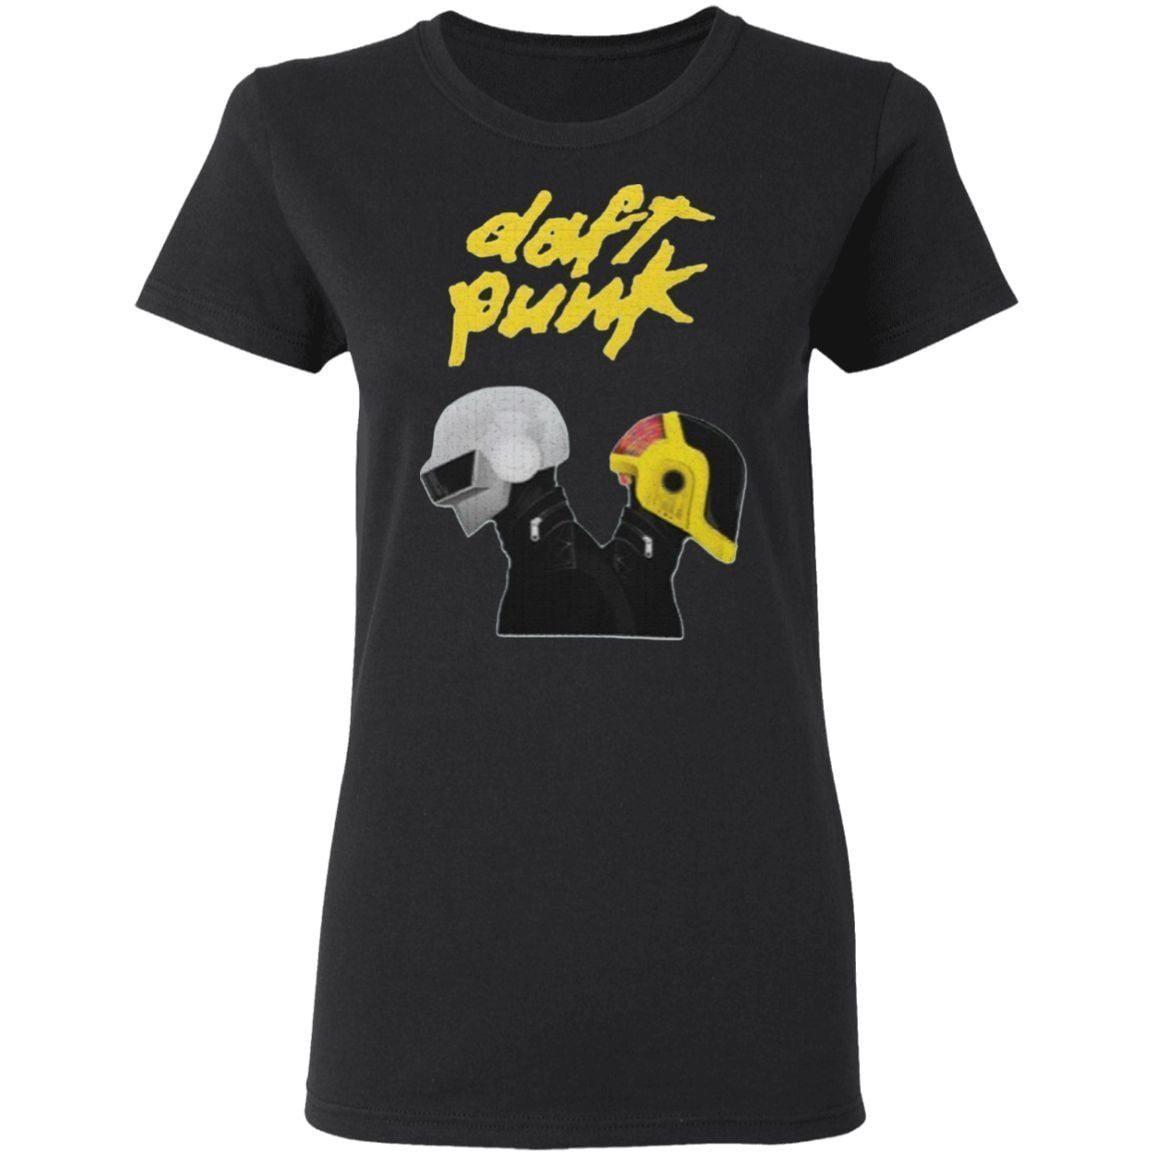 Punk Daft T Shirt